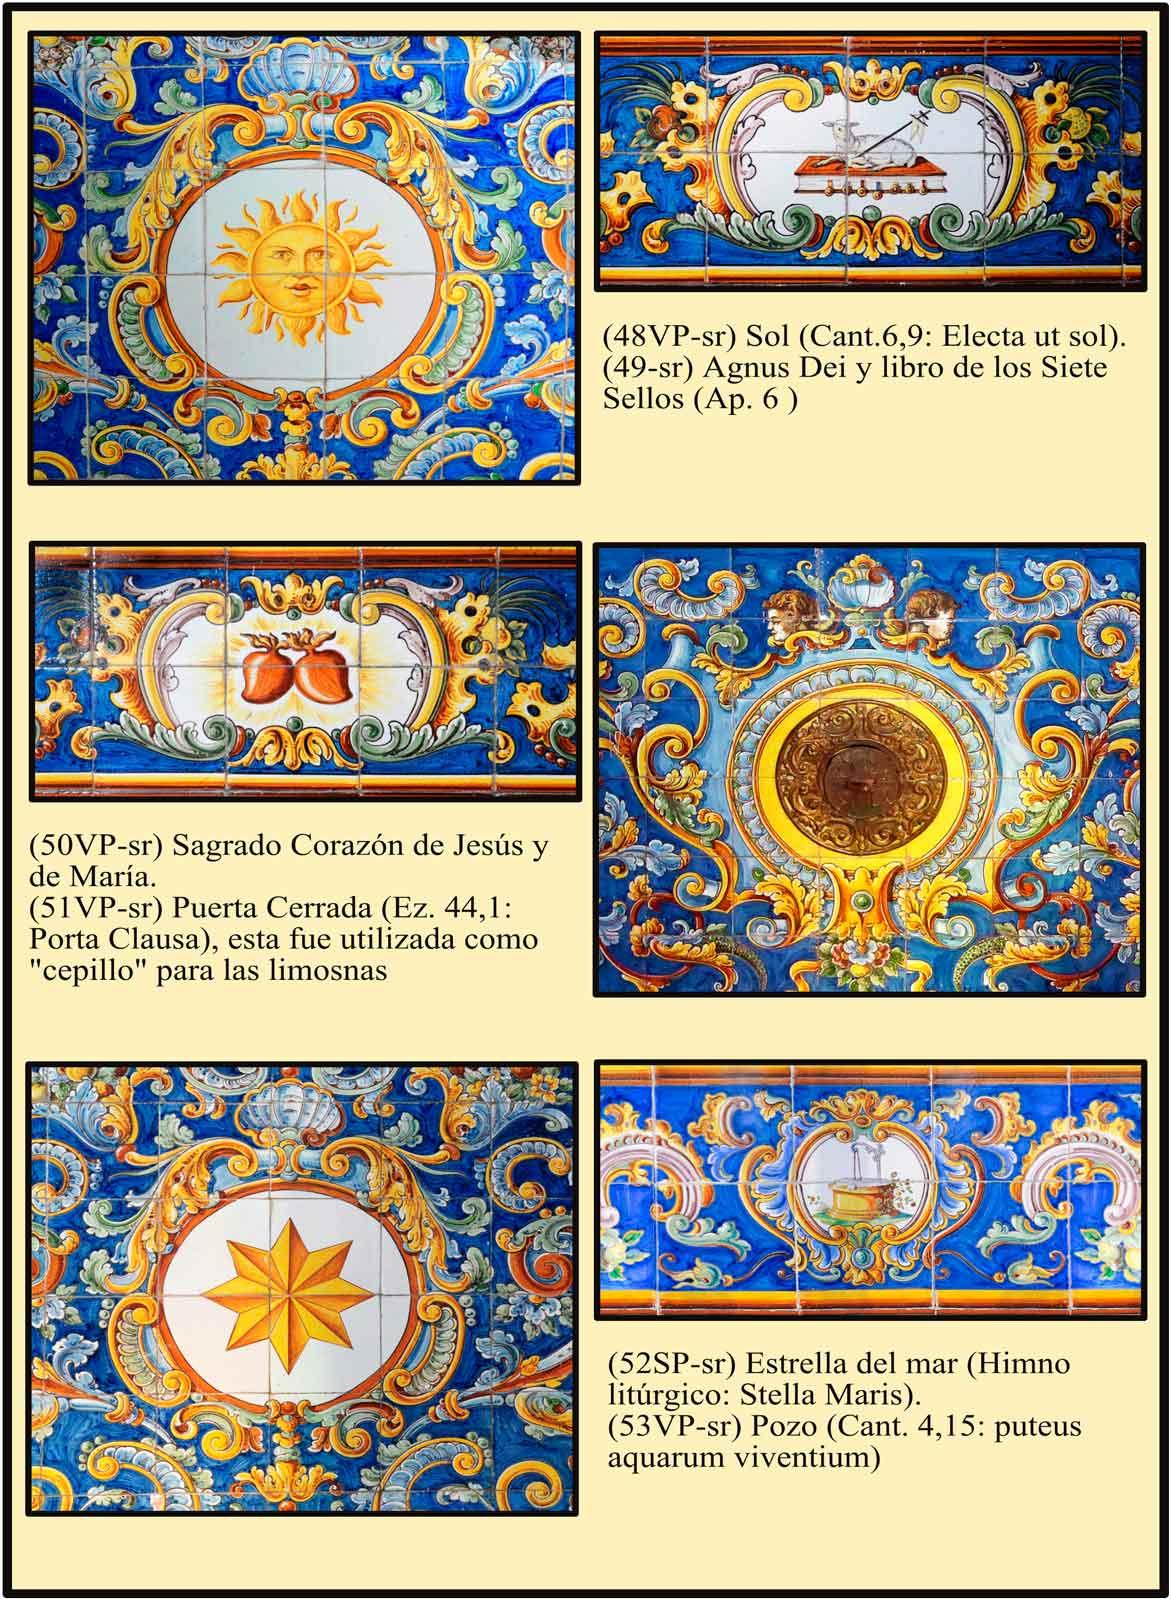 Zocalo de Azulejos de Talavera con simbolos marianos